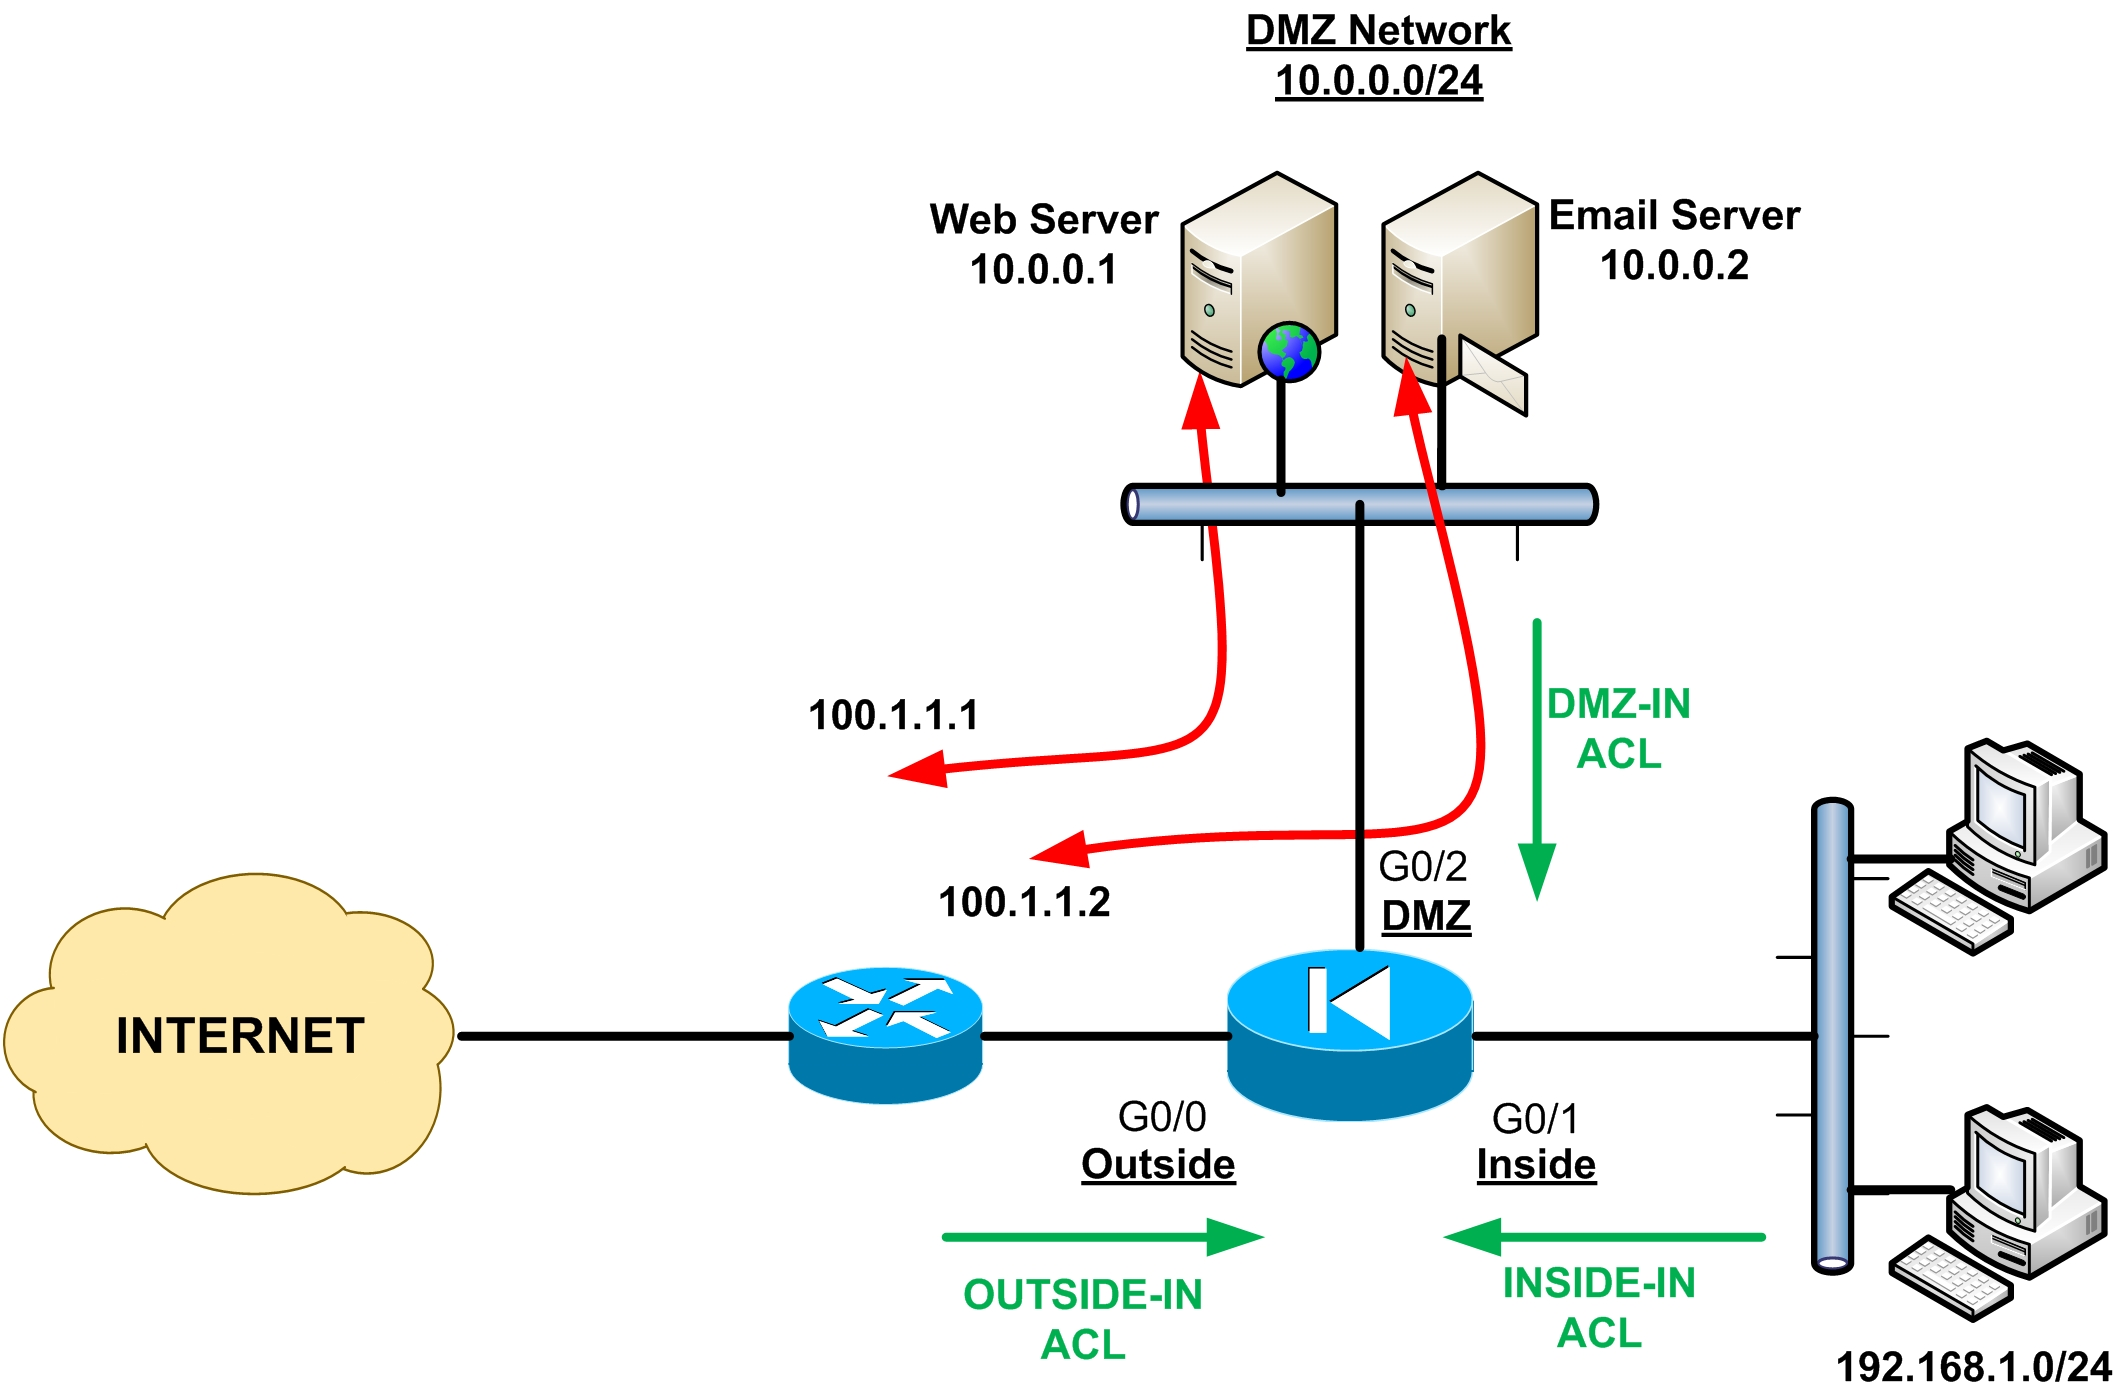 cisco asa network diagram with    cisco       asa    firewall fundamentals 3rd edition harris andrea     cisco       asa    firewall fundamentals 3rd edition harris andrea